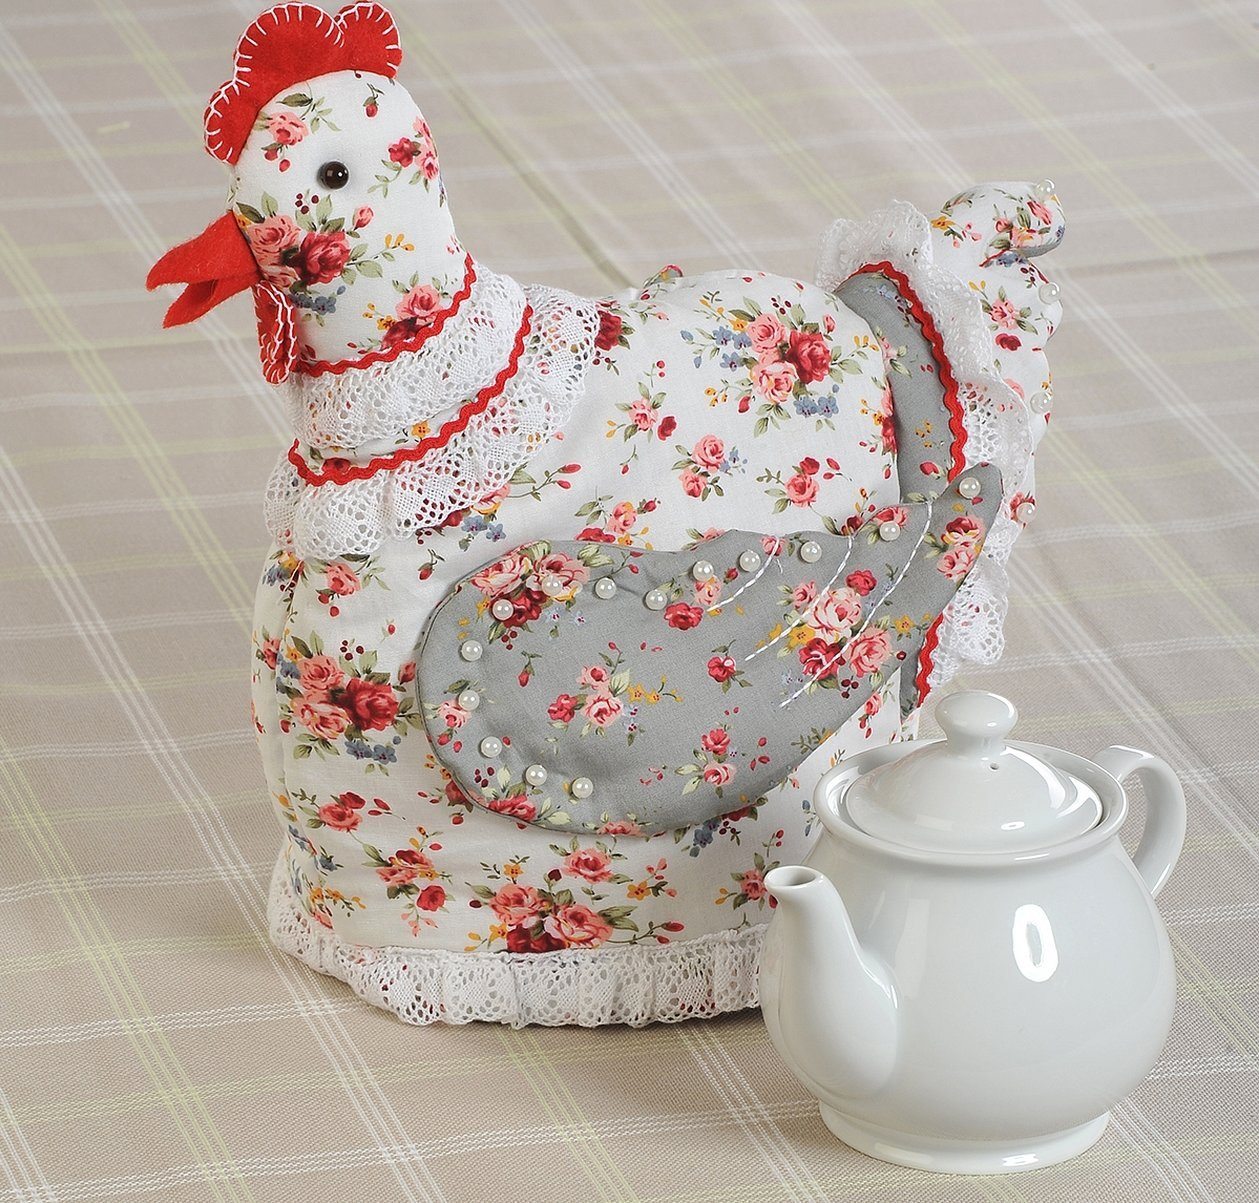 Текстильная грелка на чайник курица